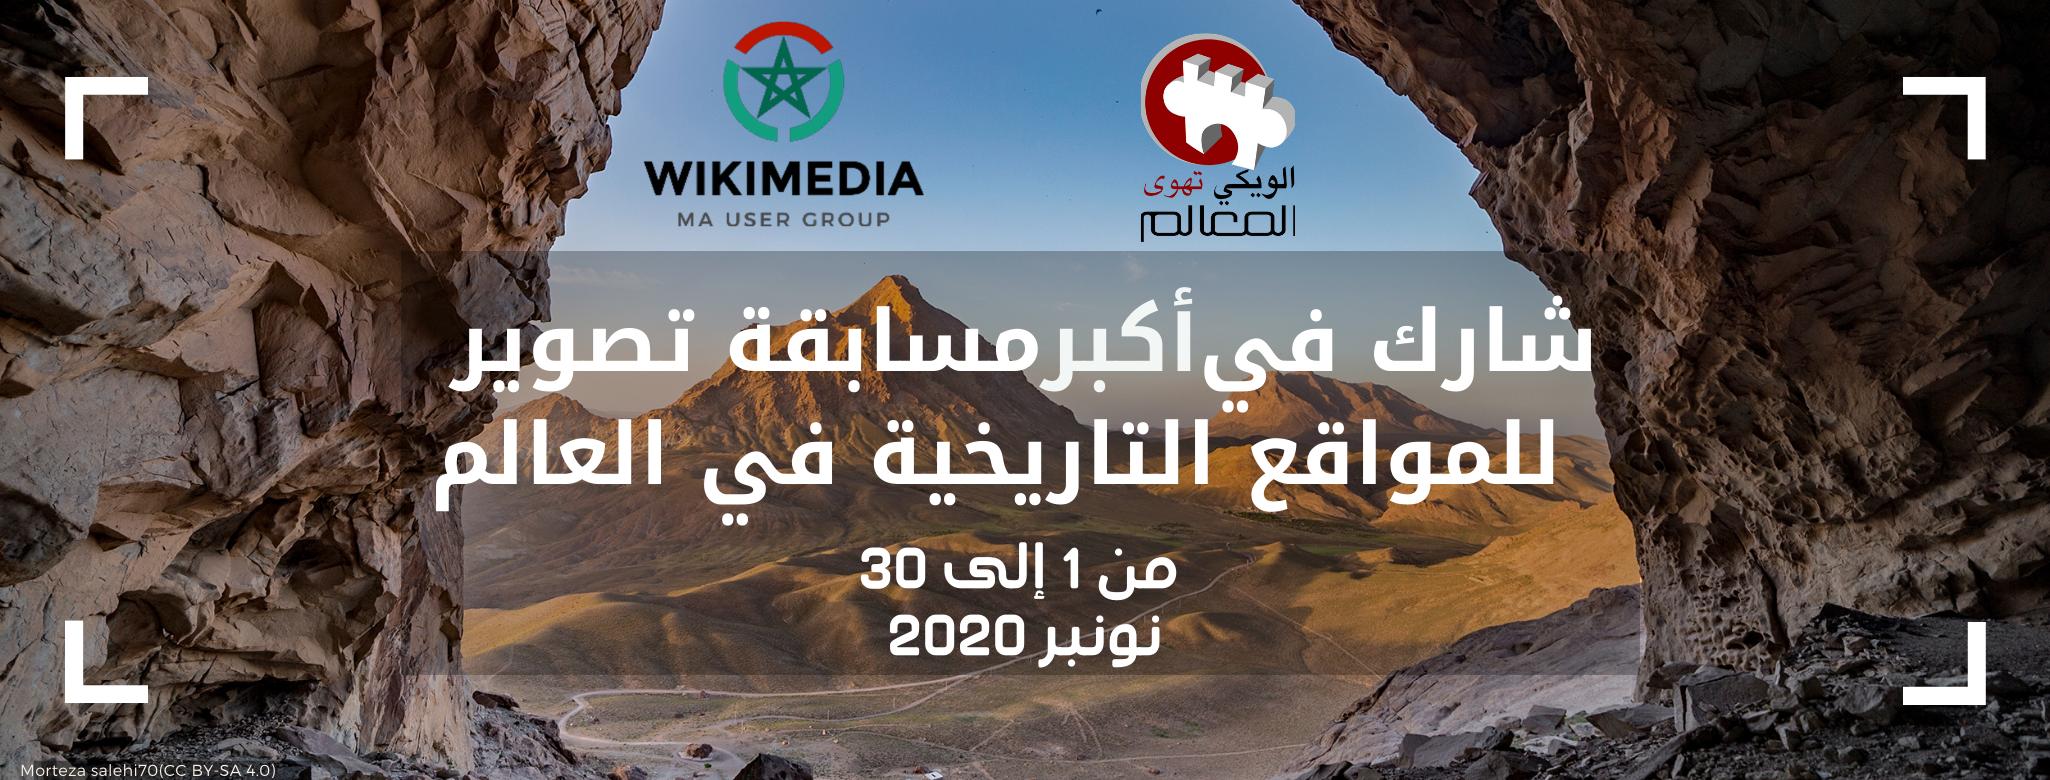 hereby publish it under the following license: English WLA 2020 MOROCCAN SOCIAL MEDIA COVER 1 author name string: Rachidourkia Wikimedia username: Rachidourkia